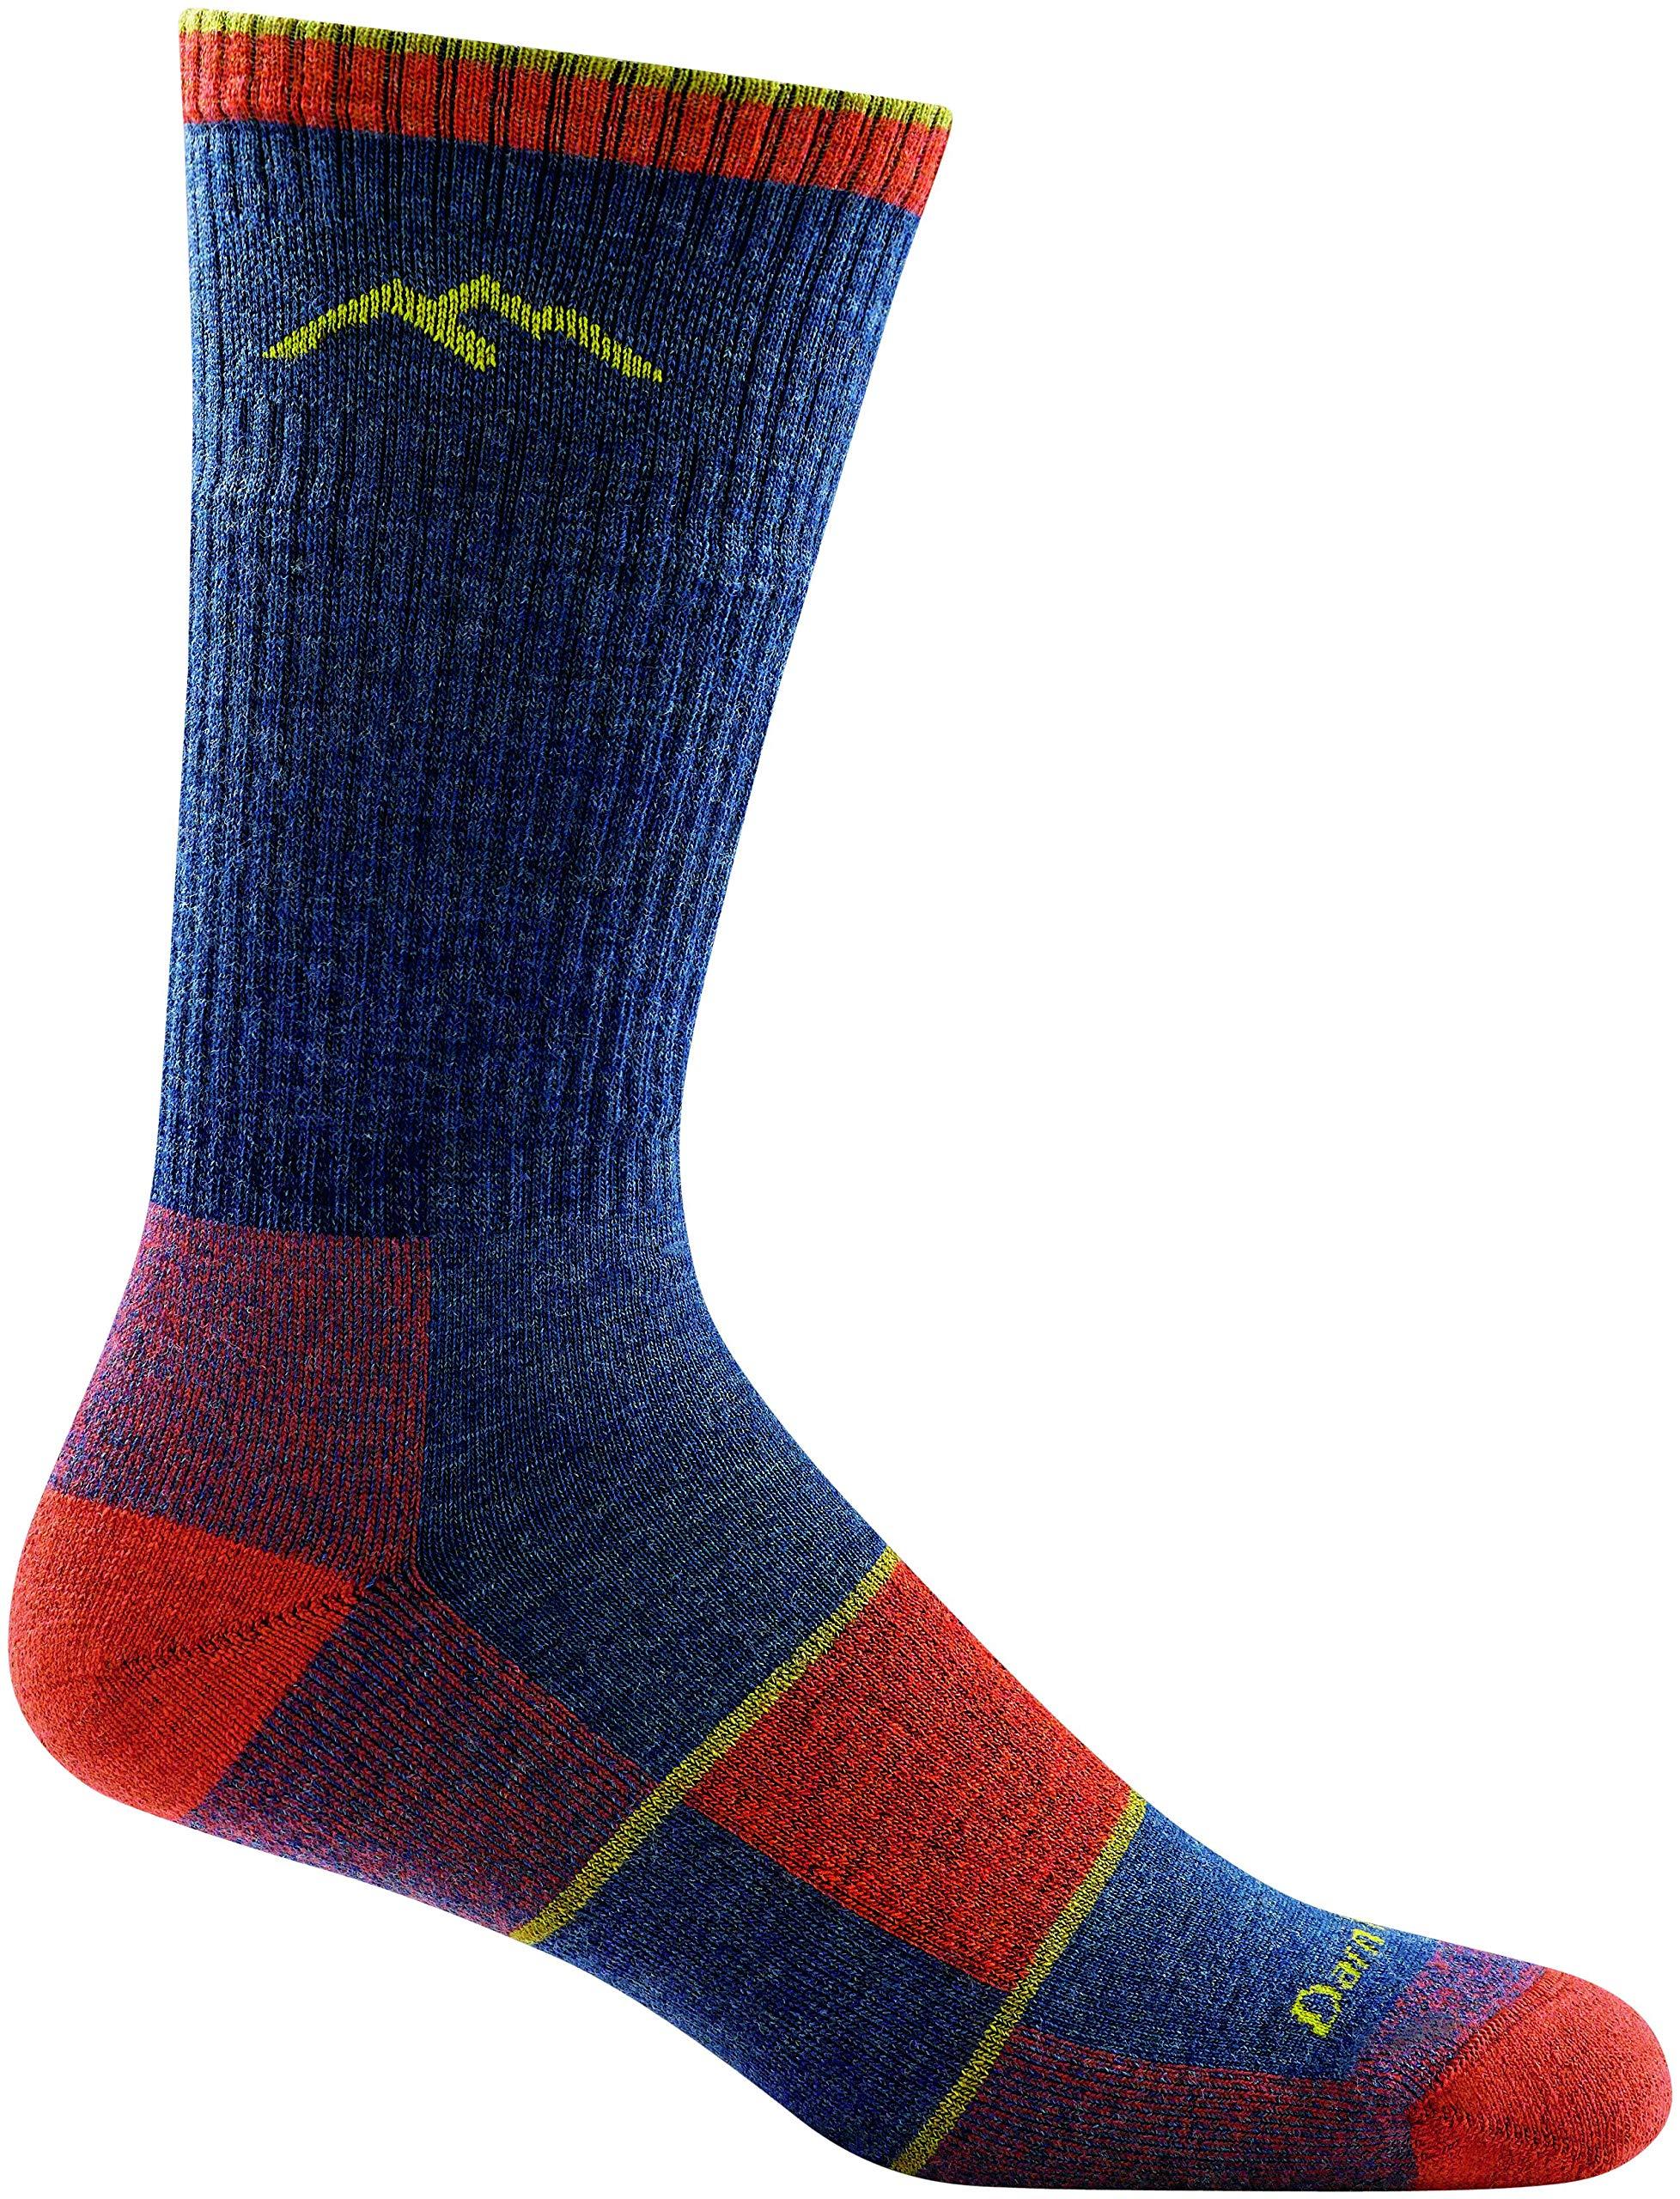 Darn Tough Hike/Trek Cushion Boot Sock - Men's Denim X-Large by Darn Tough